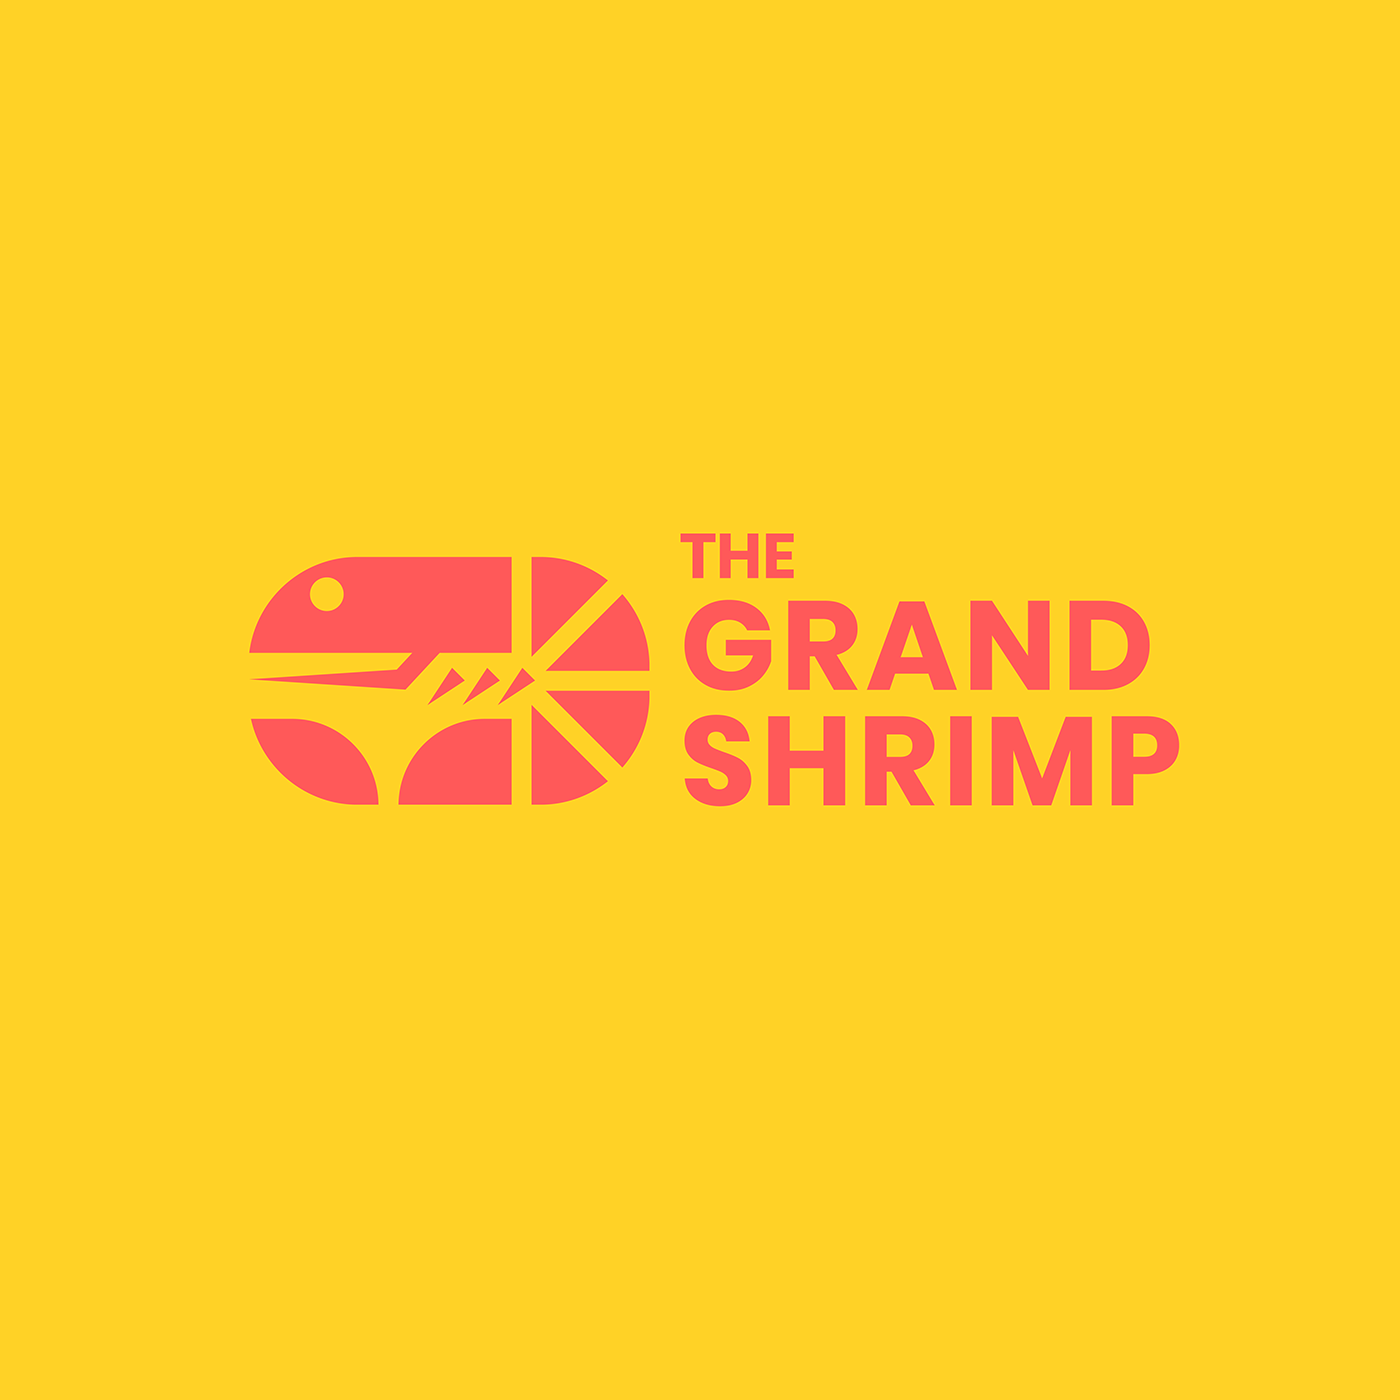 branding  graphic design  seafood branding restaurant logo Seafood Logo  Business Cards menu design Restaurant Branding Logo Design Seafood Restaurant